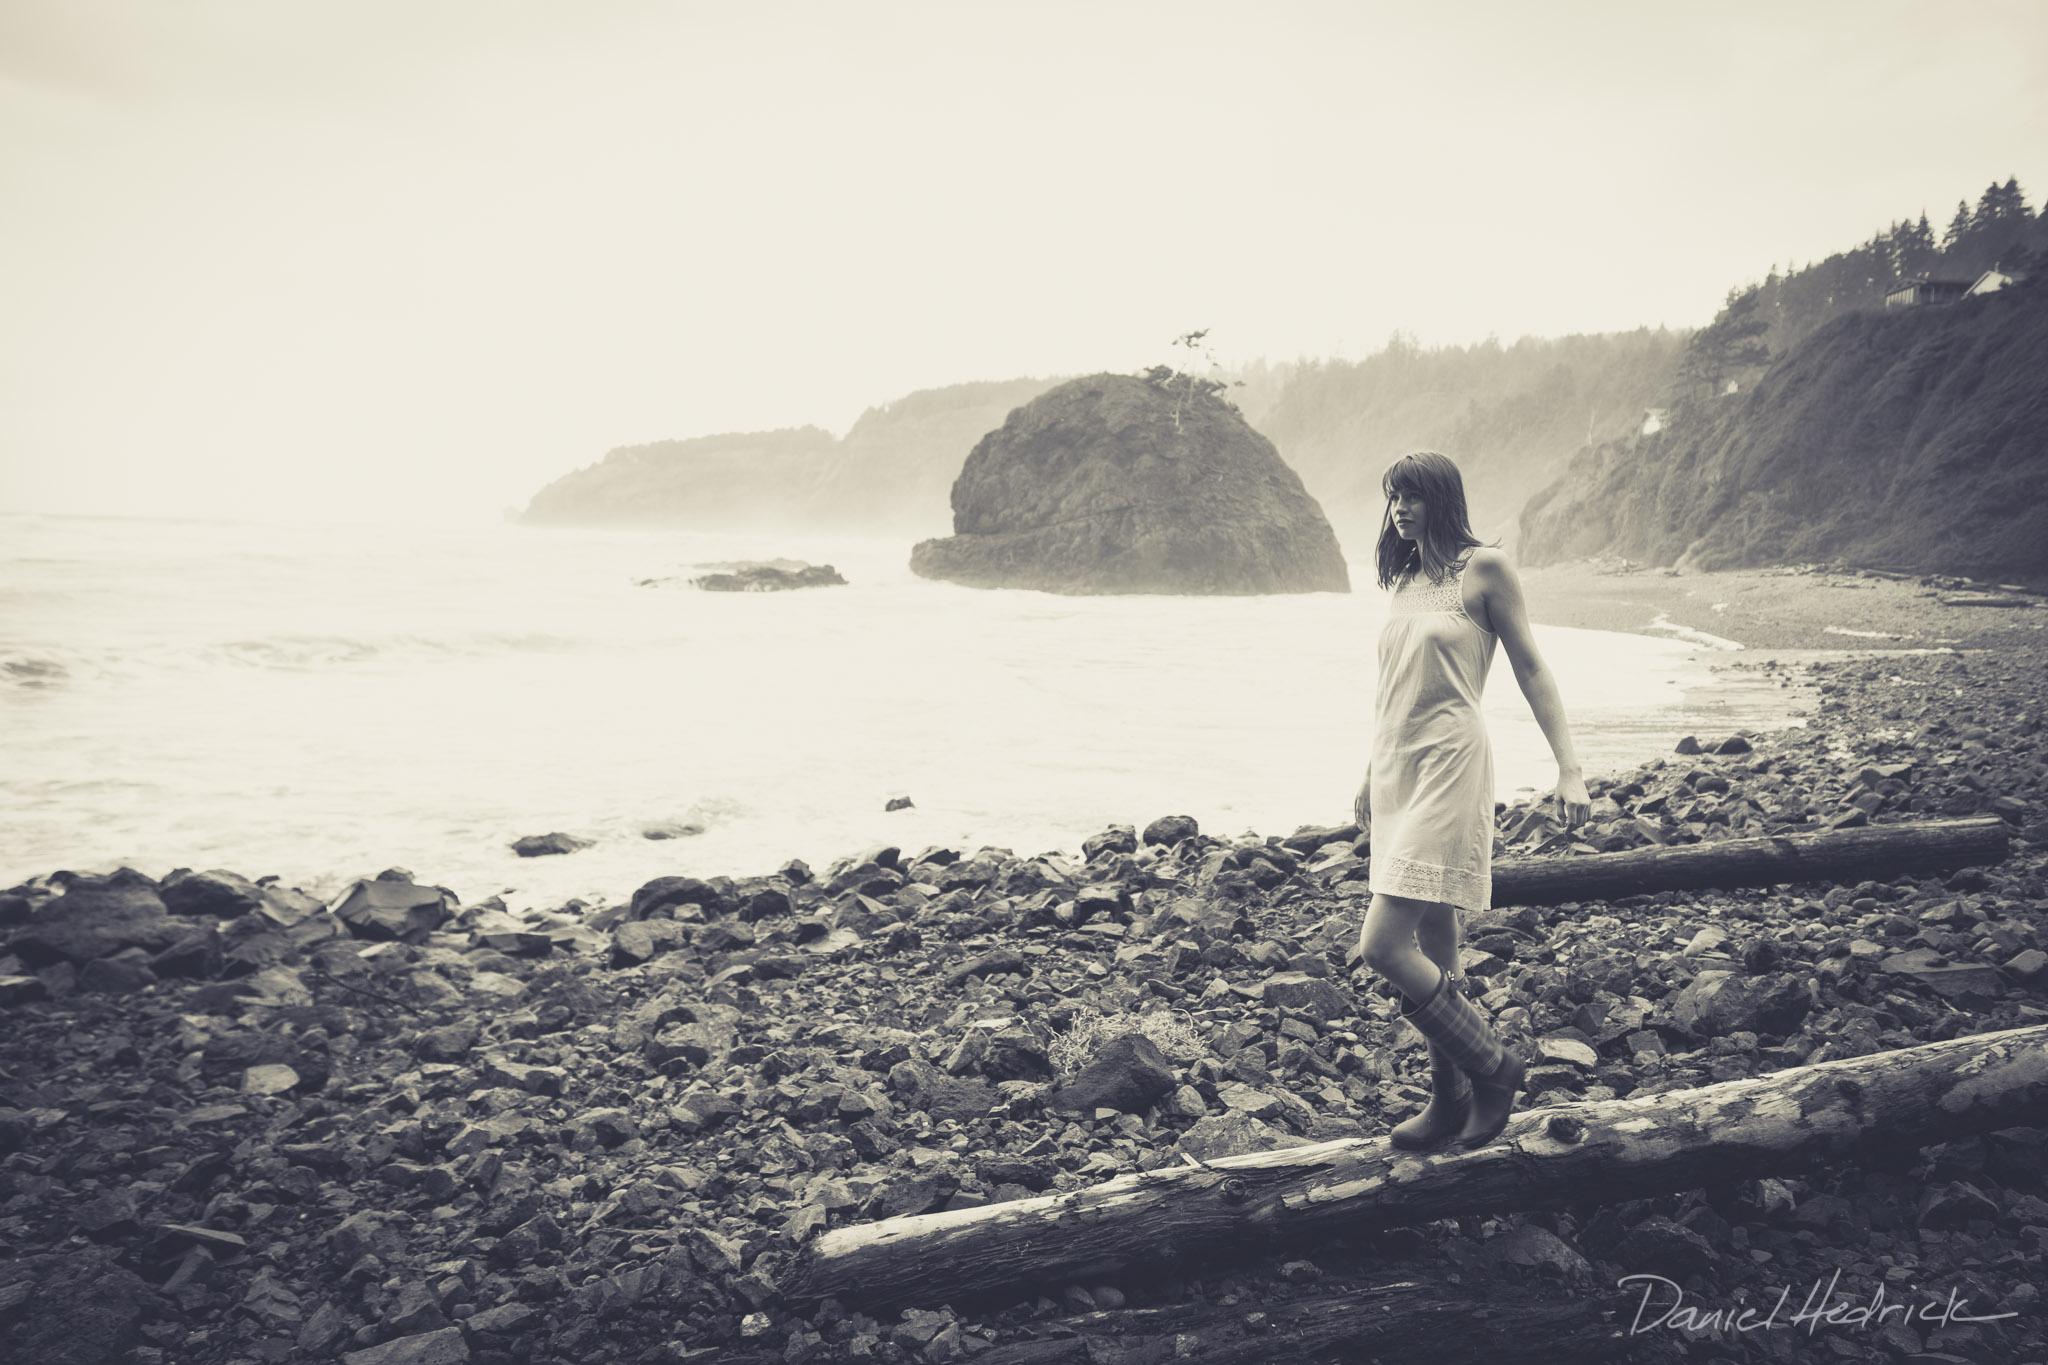 Canon EOS 5D Mk III • 1/125 • ƒ4 • 24mm • Oregon Coast